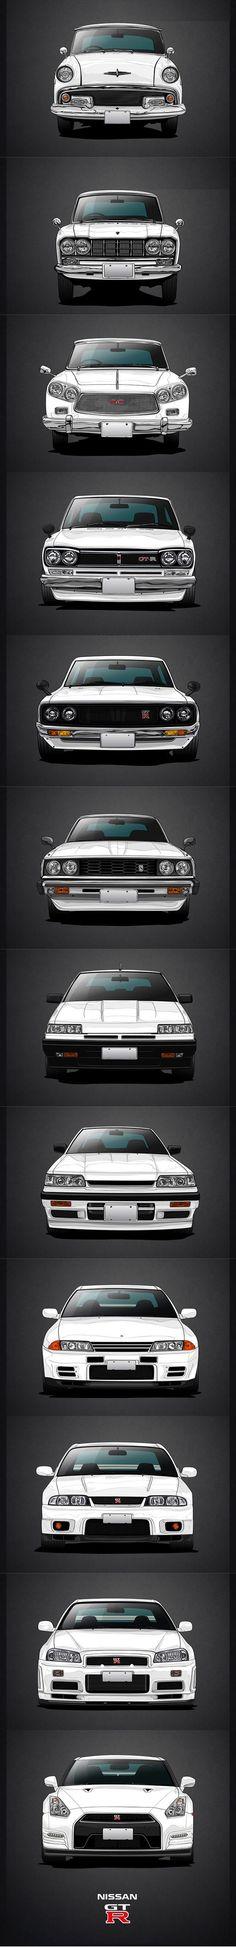 Nissan Skyline - GT-R evolution / ALS-1/2 - BLRA-3 - S50 - KPGC-10 - KPGC-110 - C210 - R30 - R31 - R32 - R33 - R34 - R35 / Prince / white / Japan / Mauricio Massami